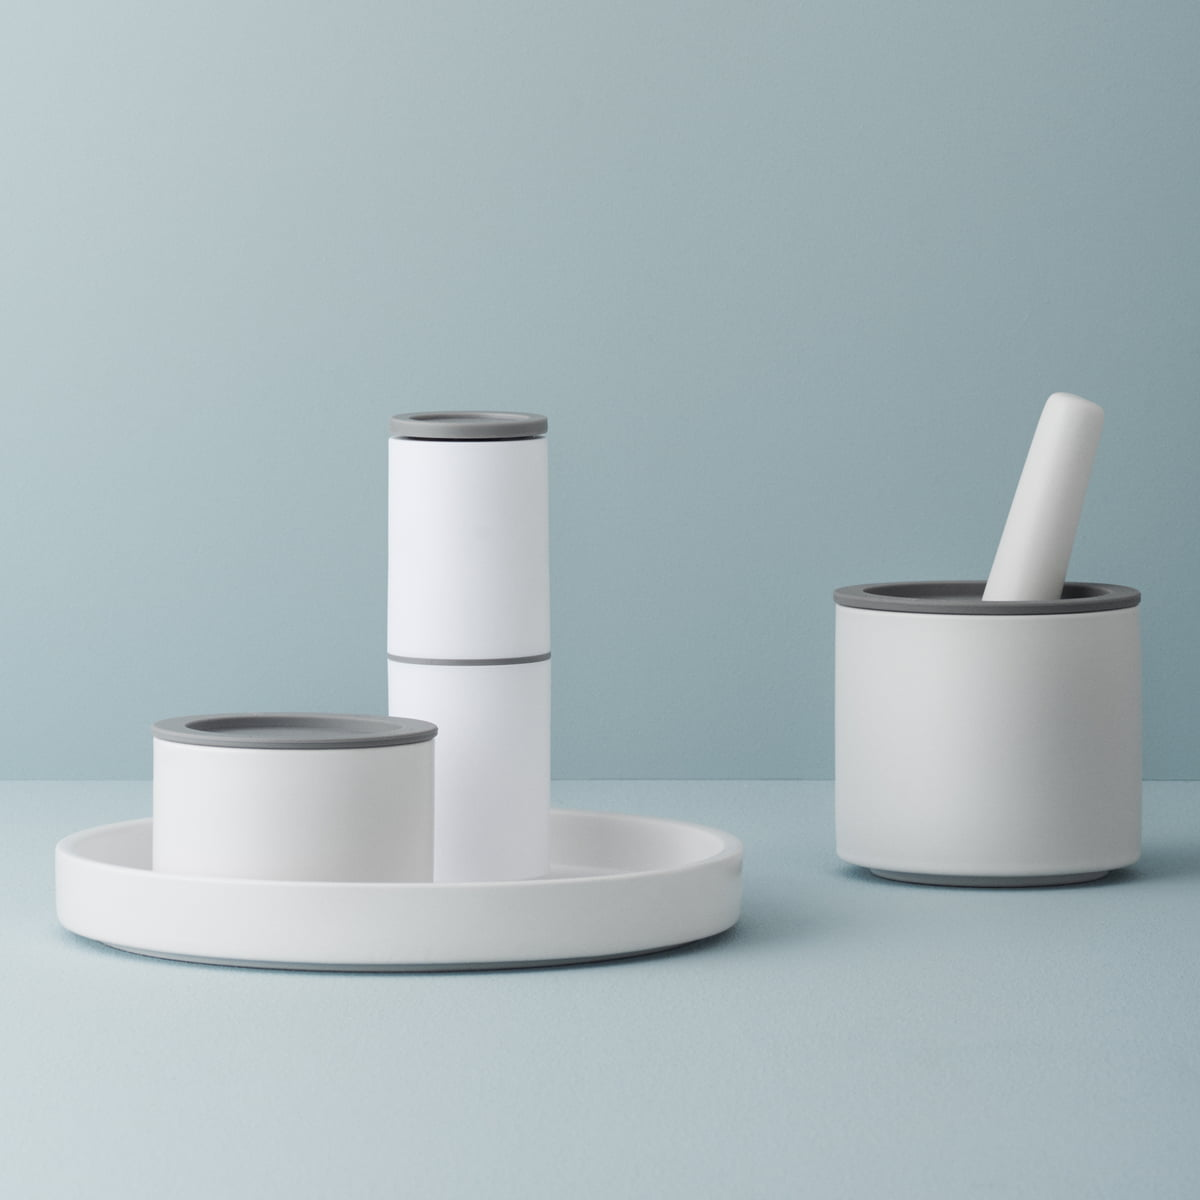 spice it tablett von rig tig by stelton im shop. Black Bedroom Furniture Sets. Home Design Ideas